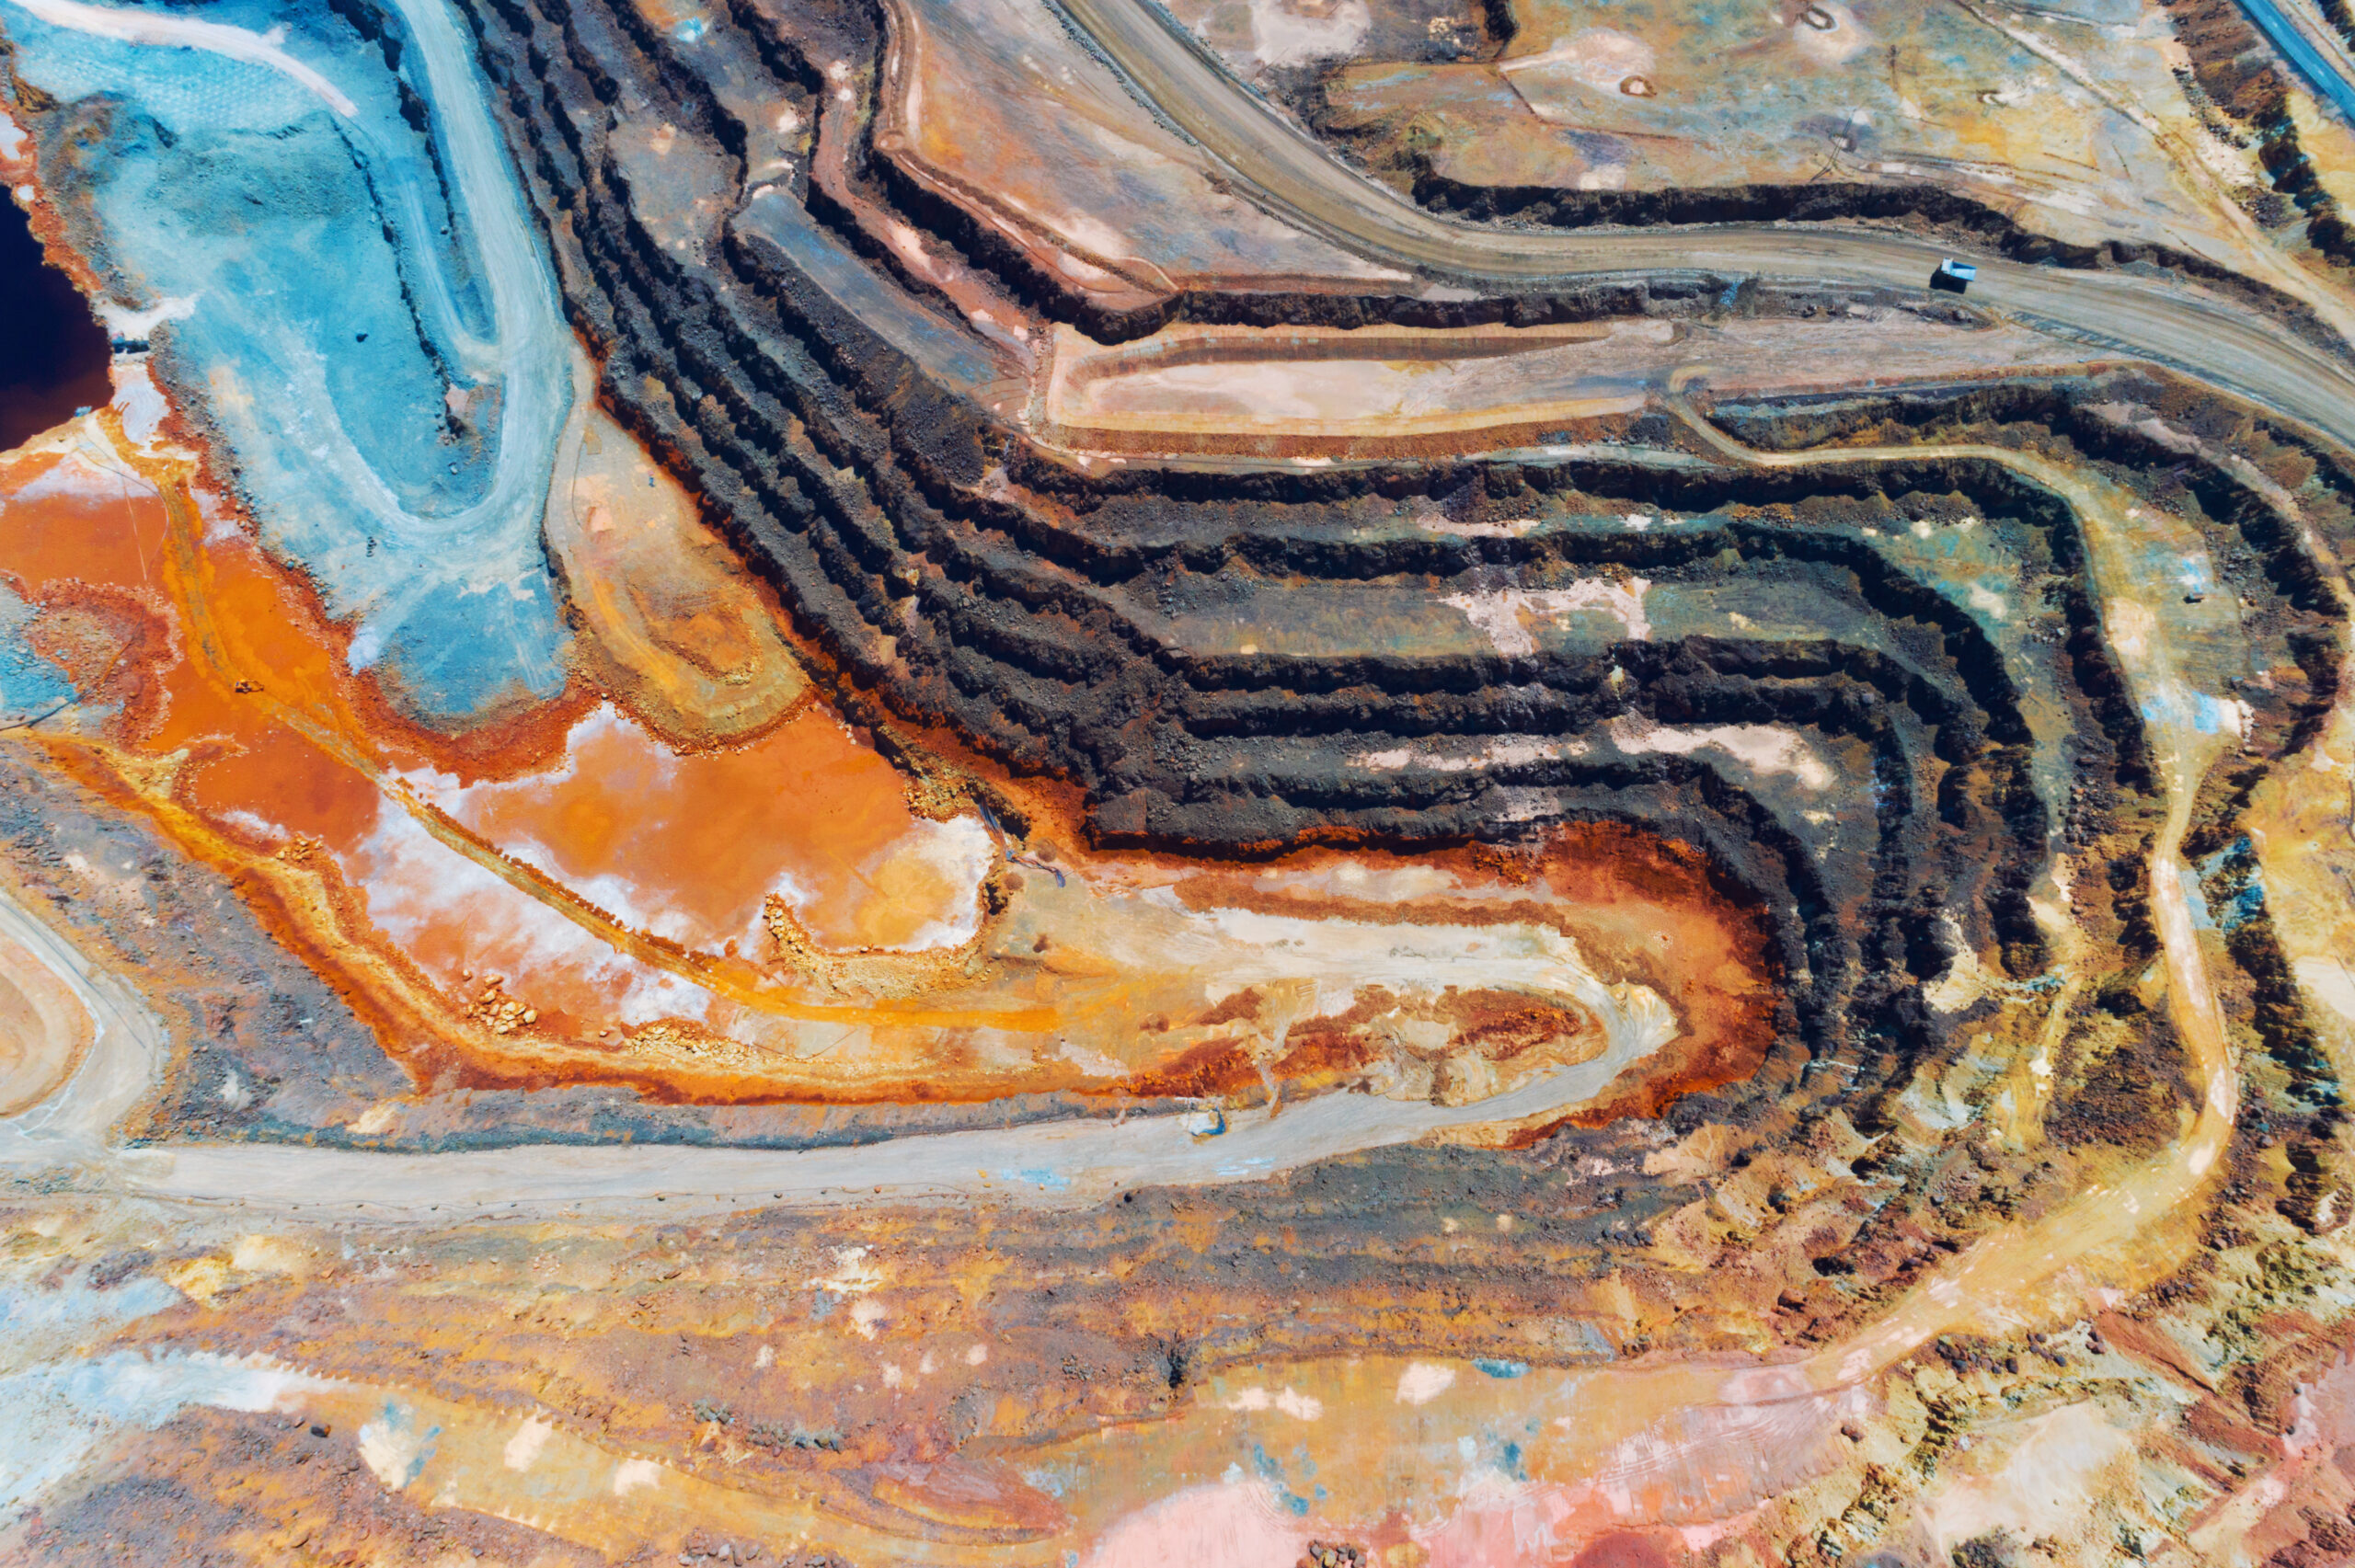 Scanarea LiDAR in exploarea miniera de suprafata